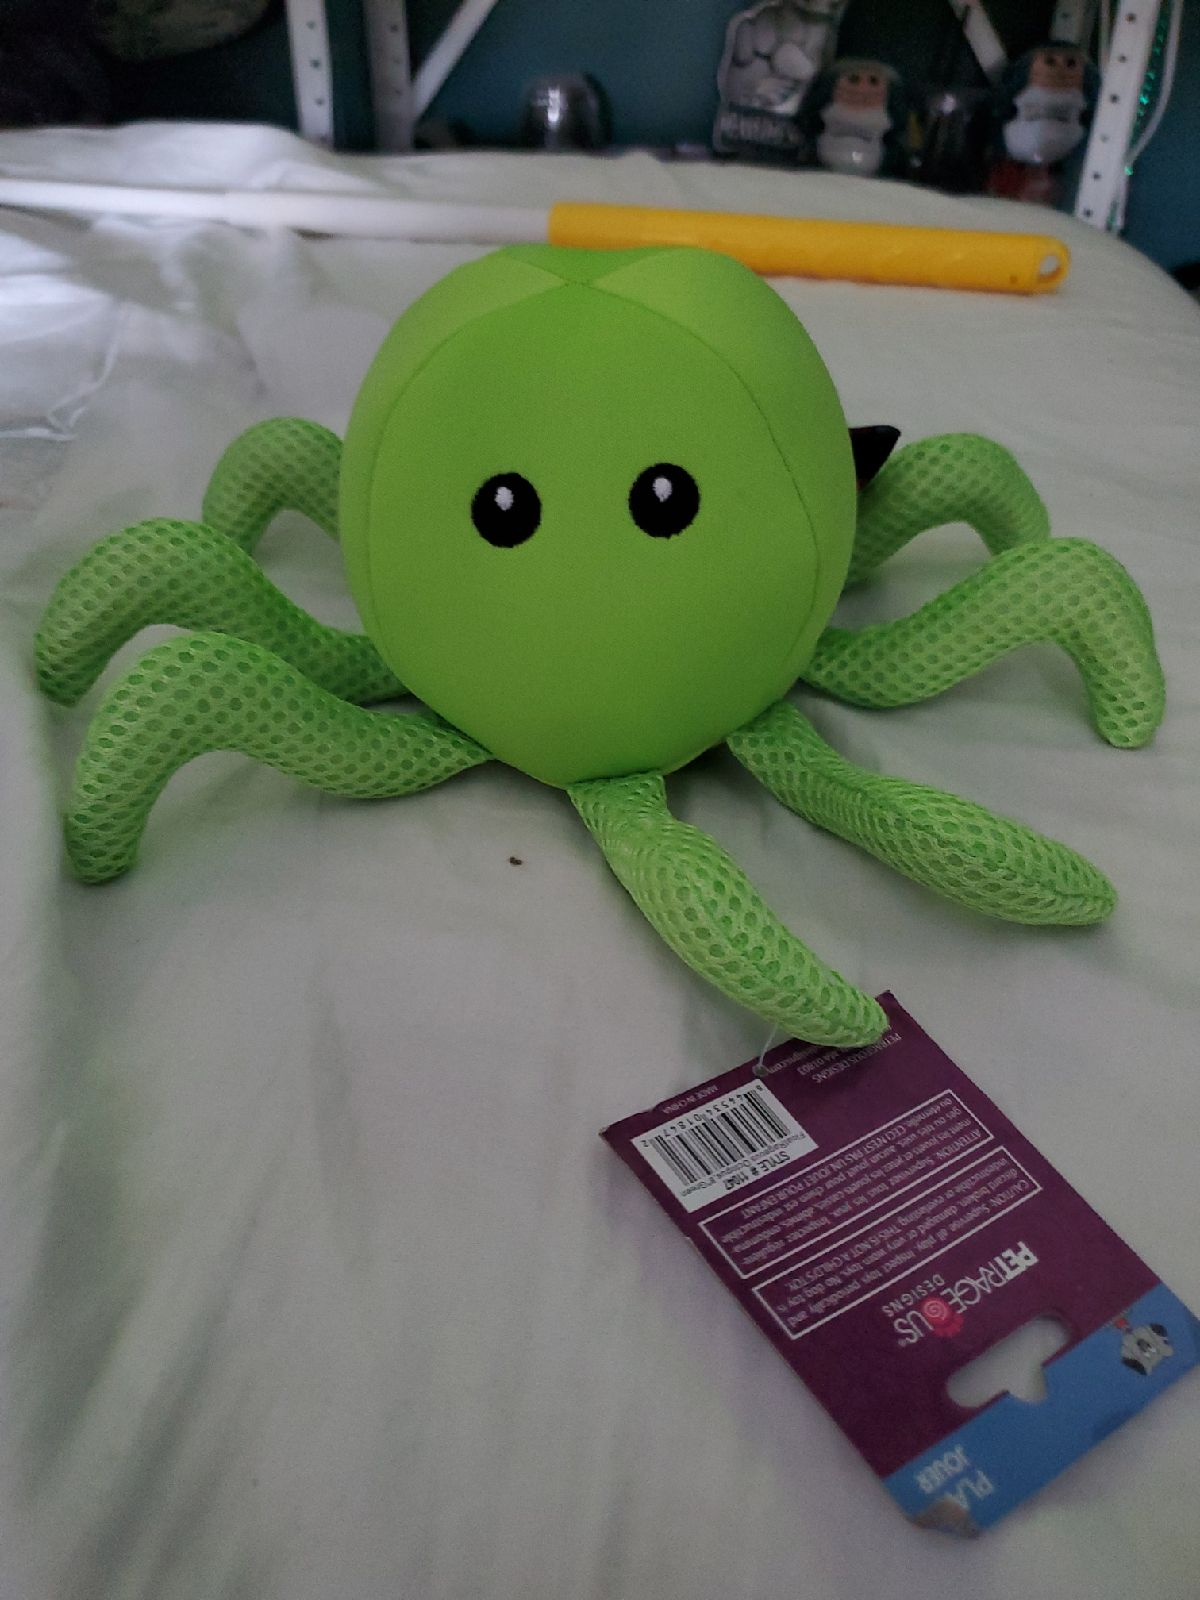 Petrageous floatrageous octopus dog toy